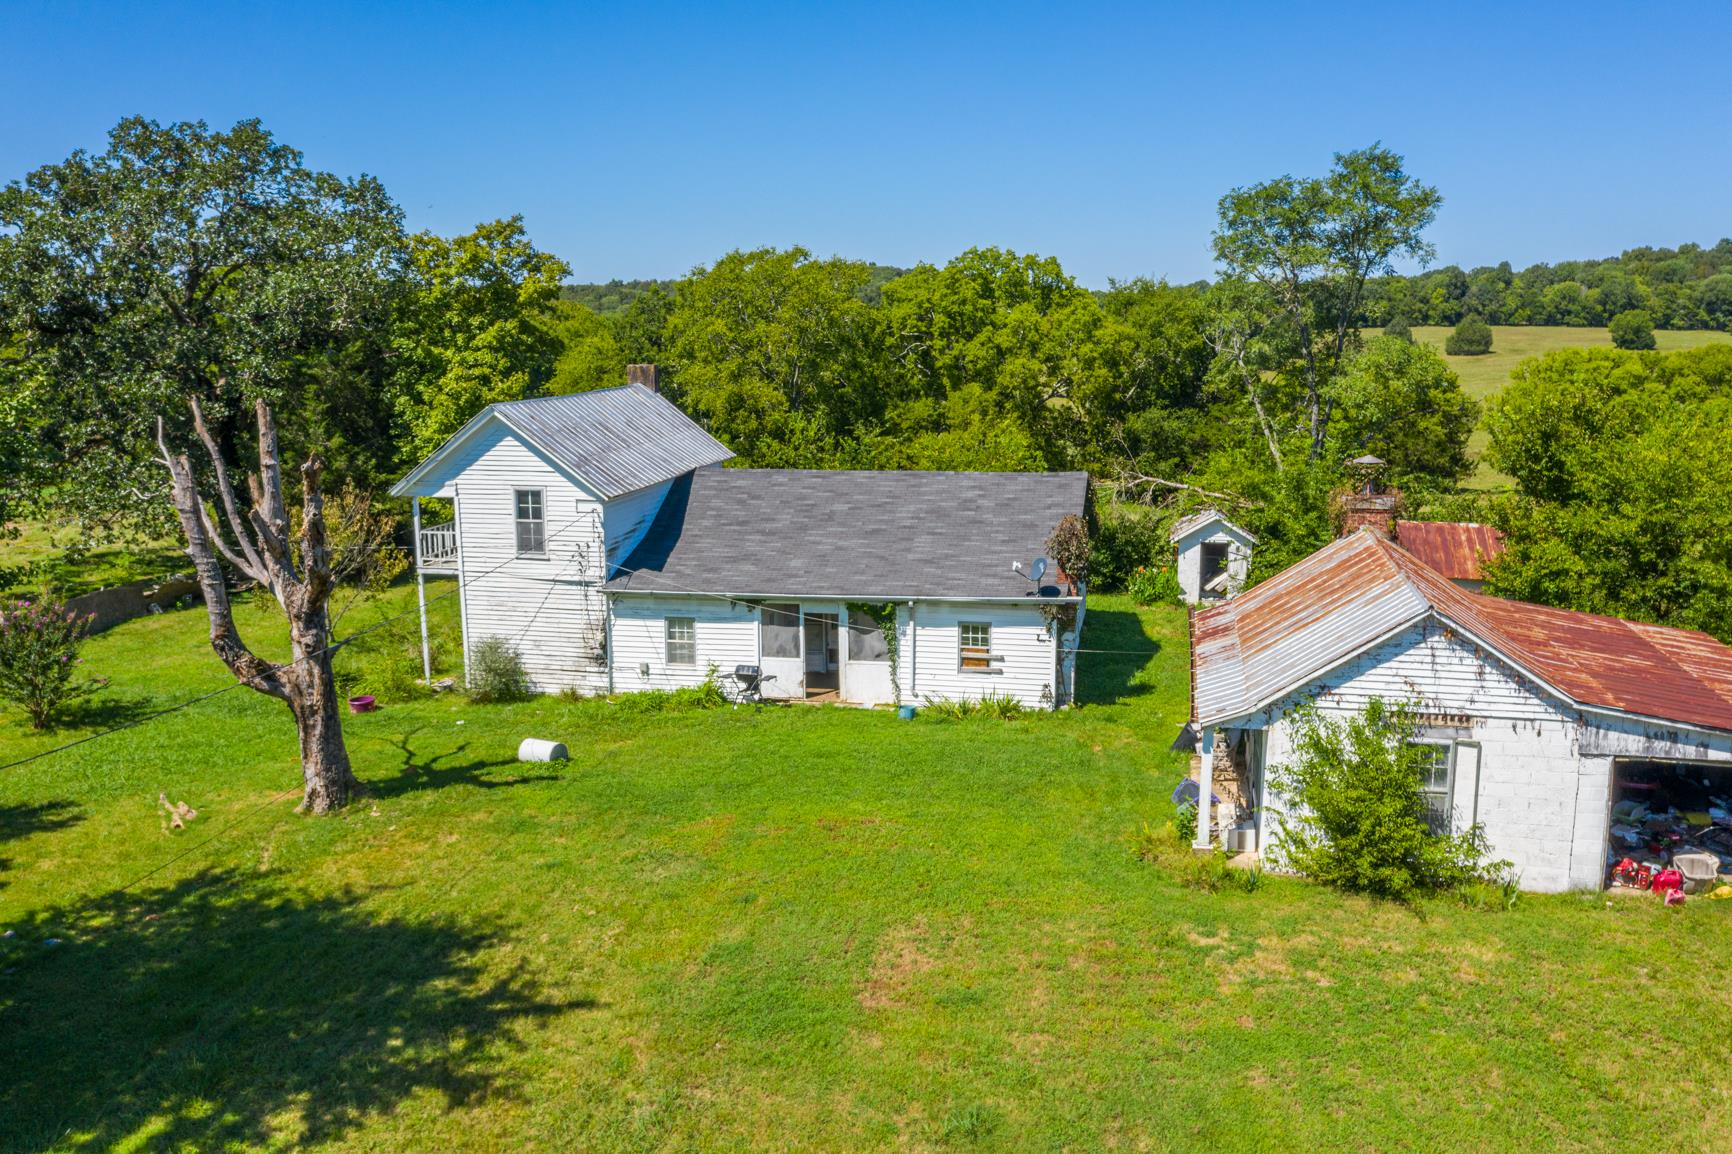 965 Atkinson Rd, Lebanon, TN 37090 - Lebanon, TN real estate listing